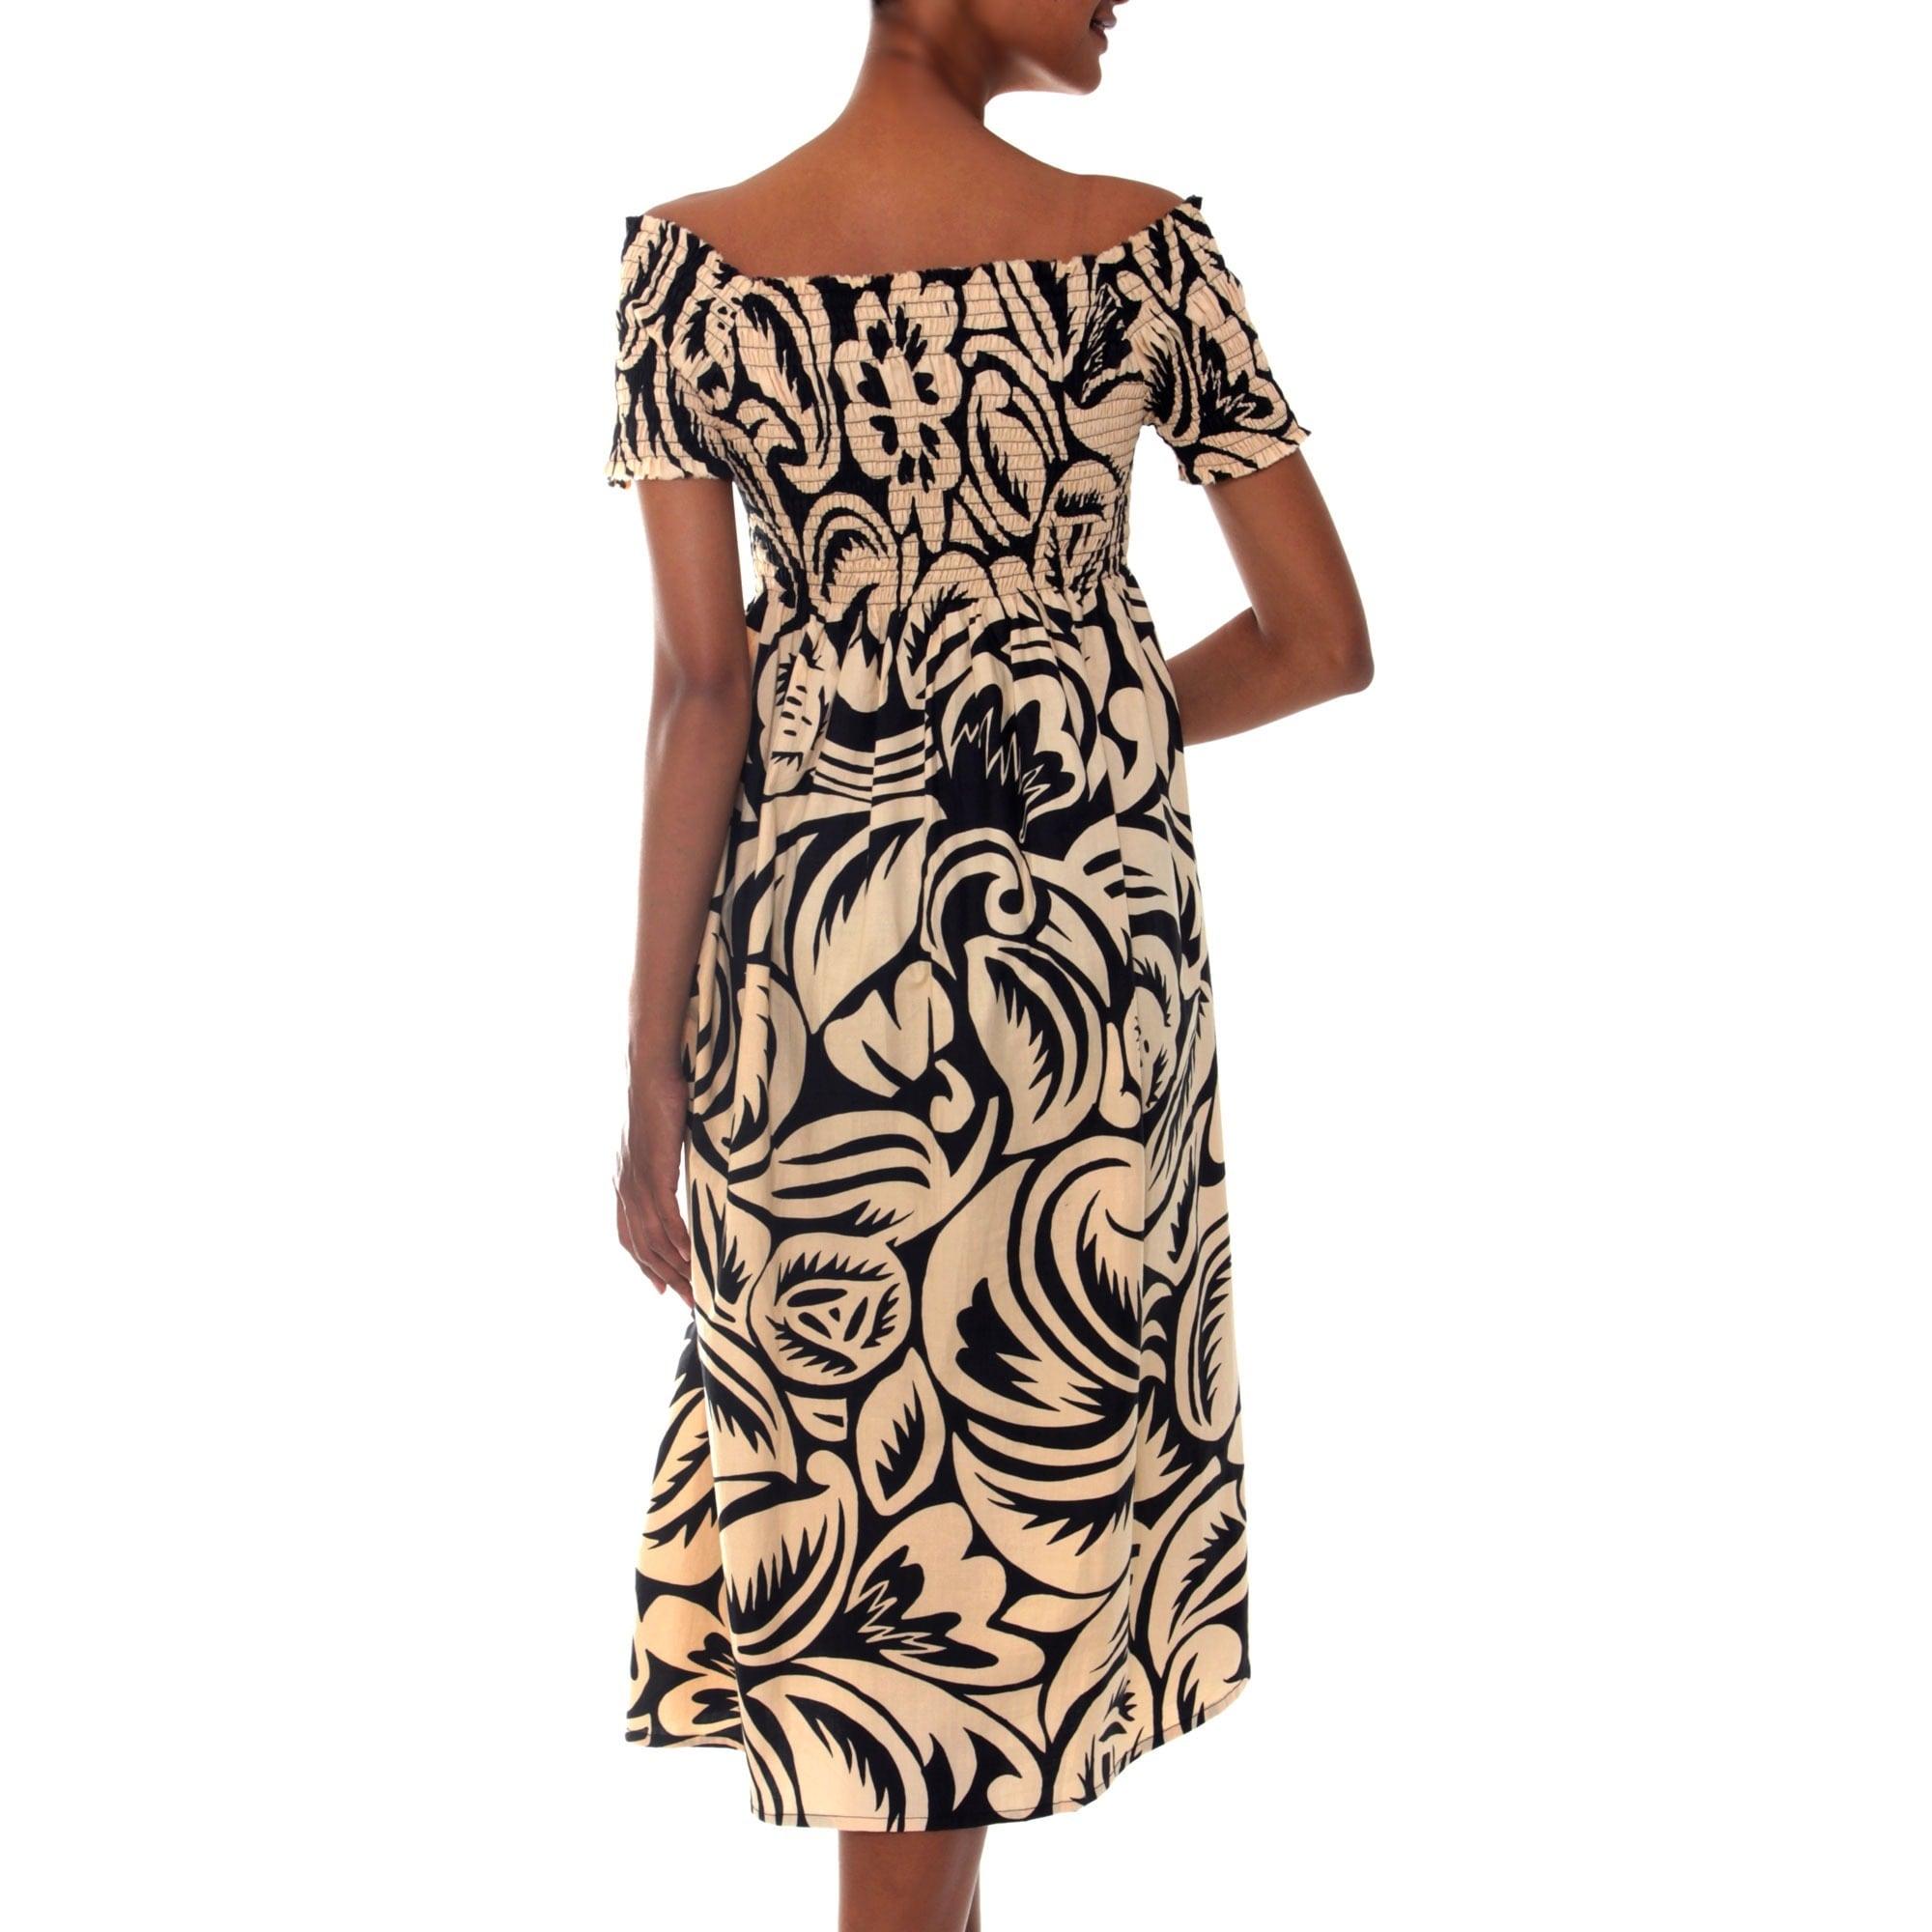 2b996a9c52dd Shop Handmade Cotton Batik  Bali Shadows  Dress (Indonesia) - Free Shipping  On Orders Over  45 - Overstock - 6387212